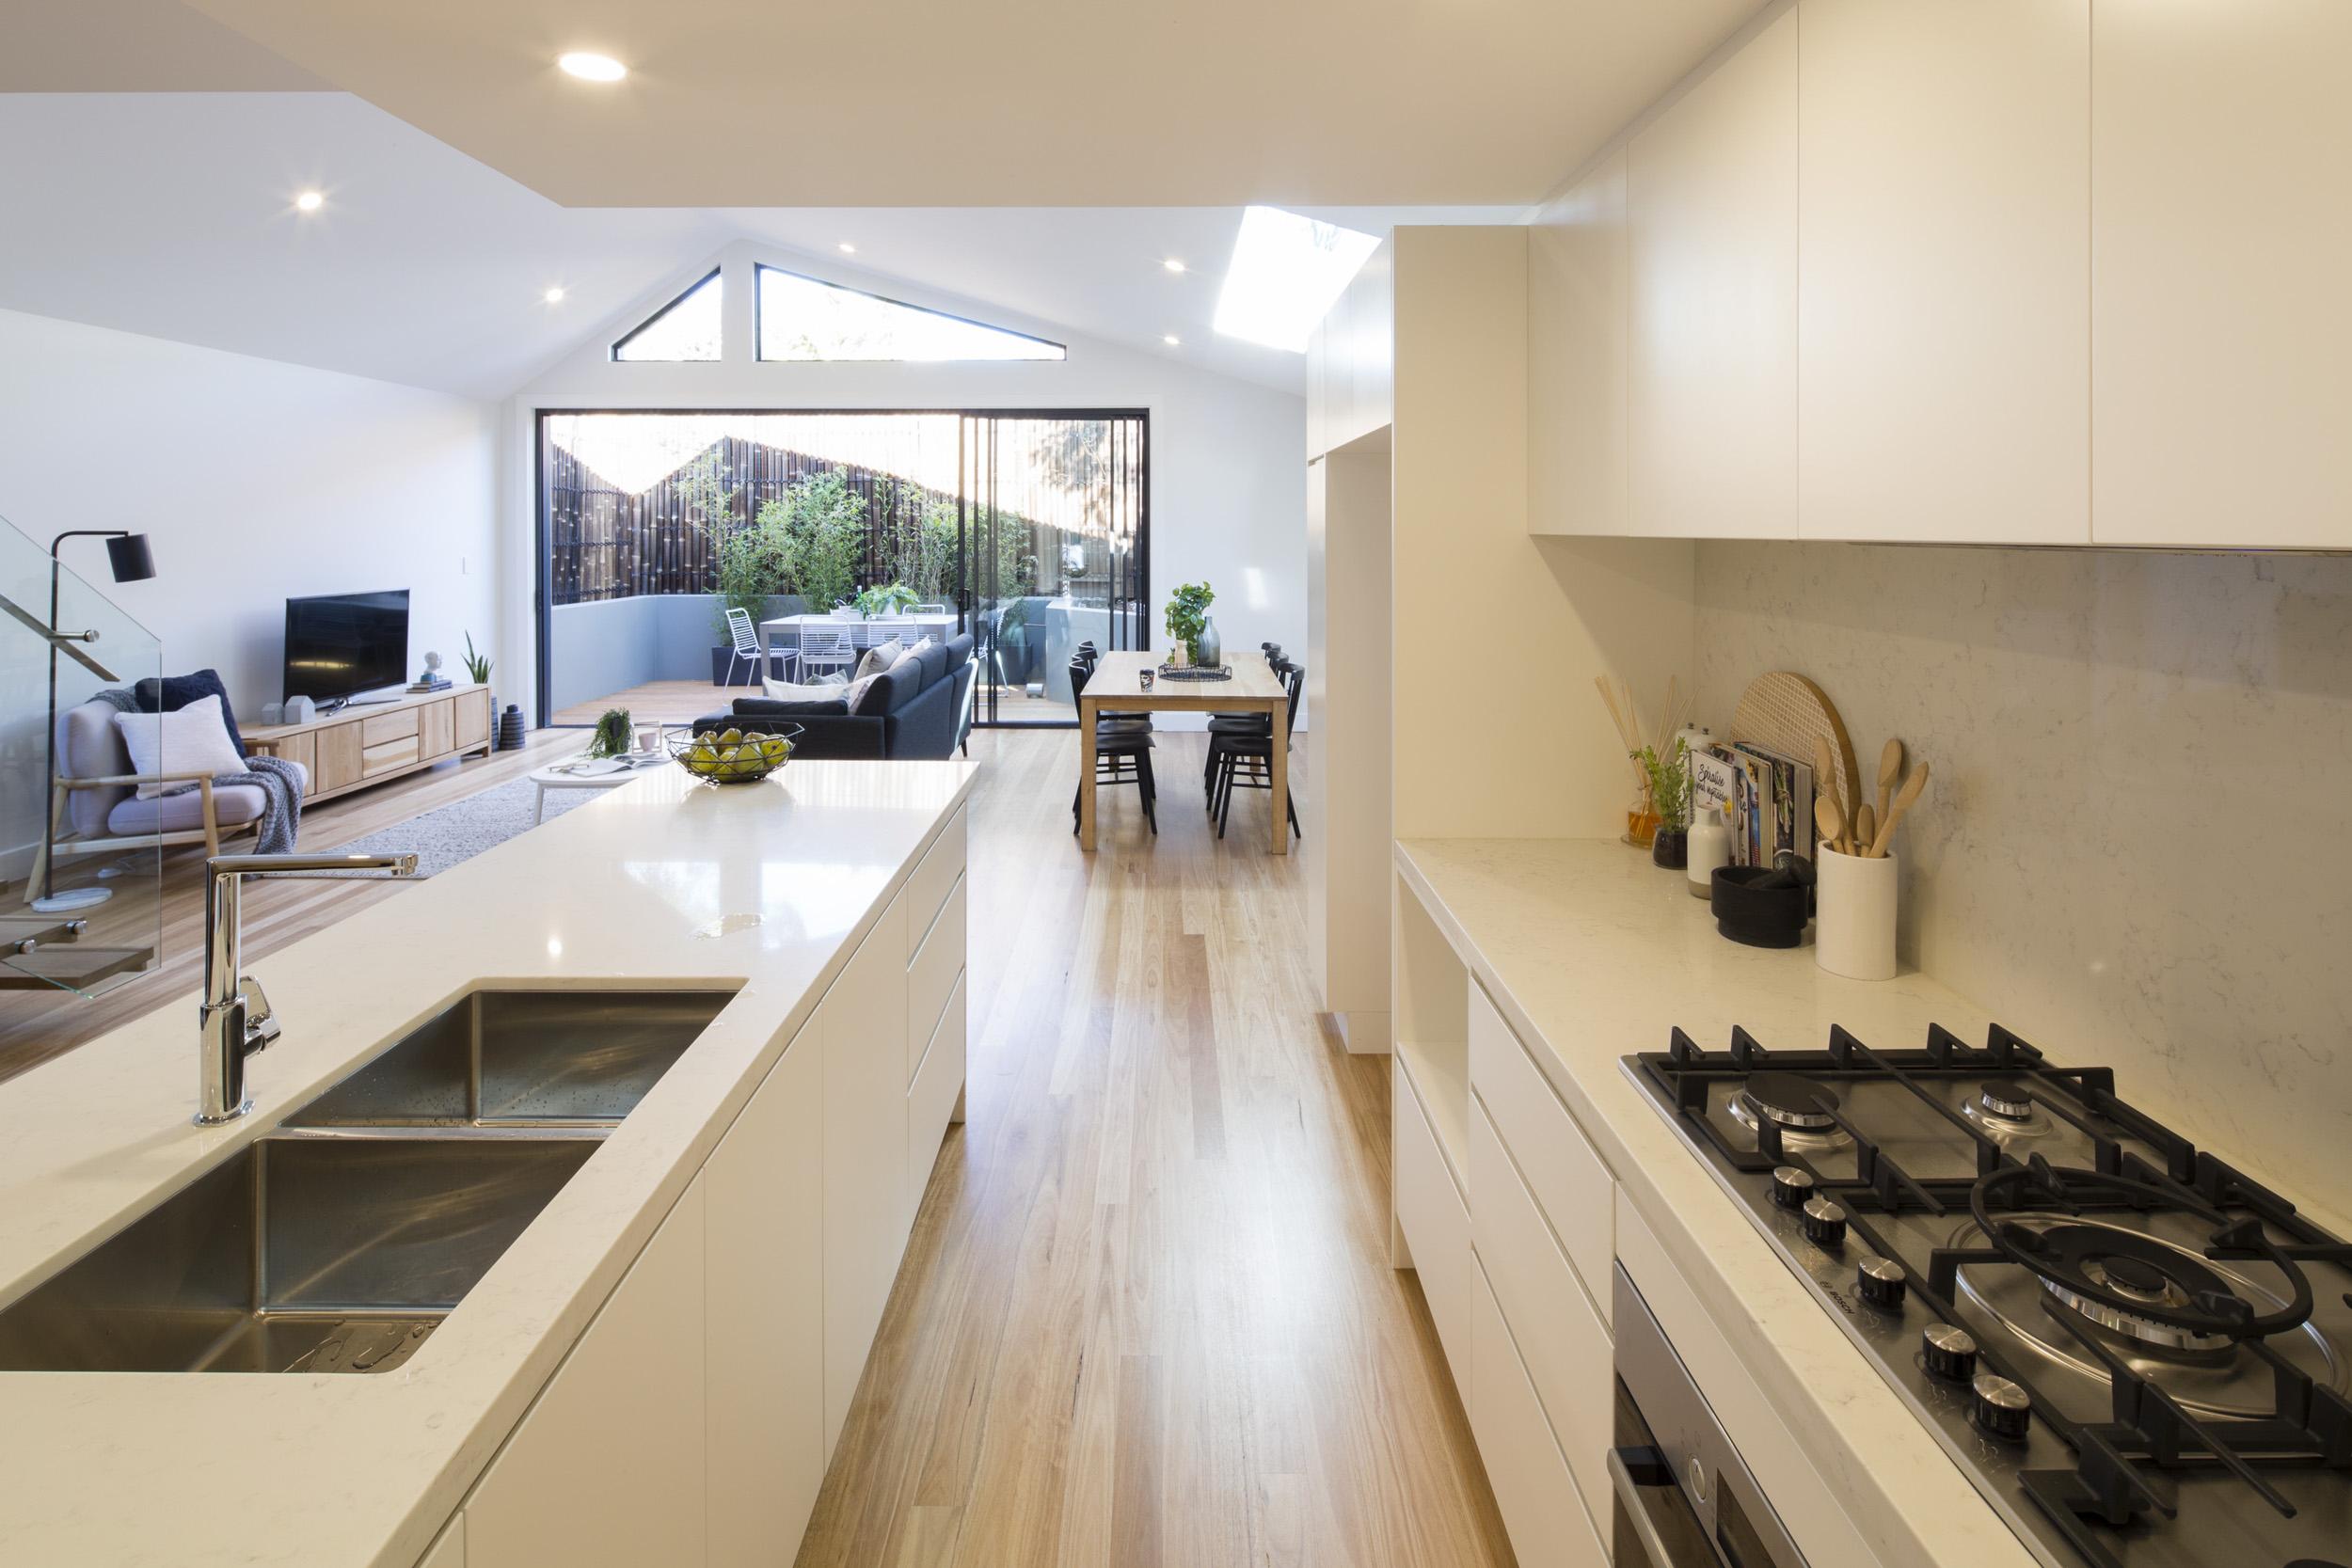 house_photographer_sydney_ns_studio_architects_09.jpg